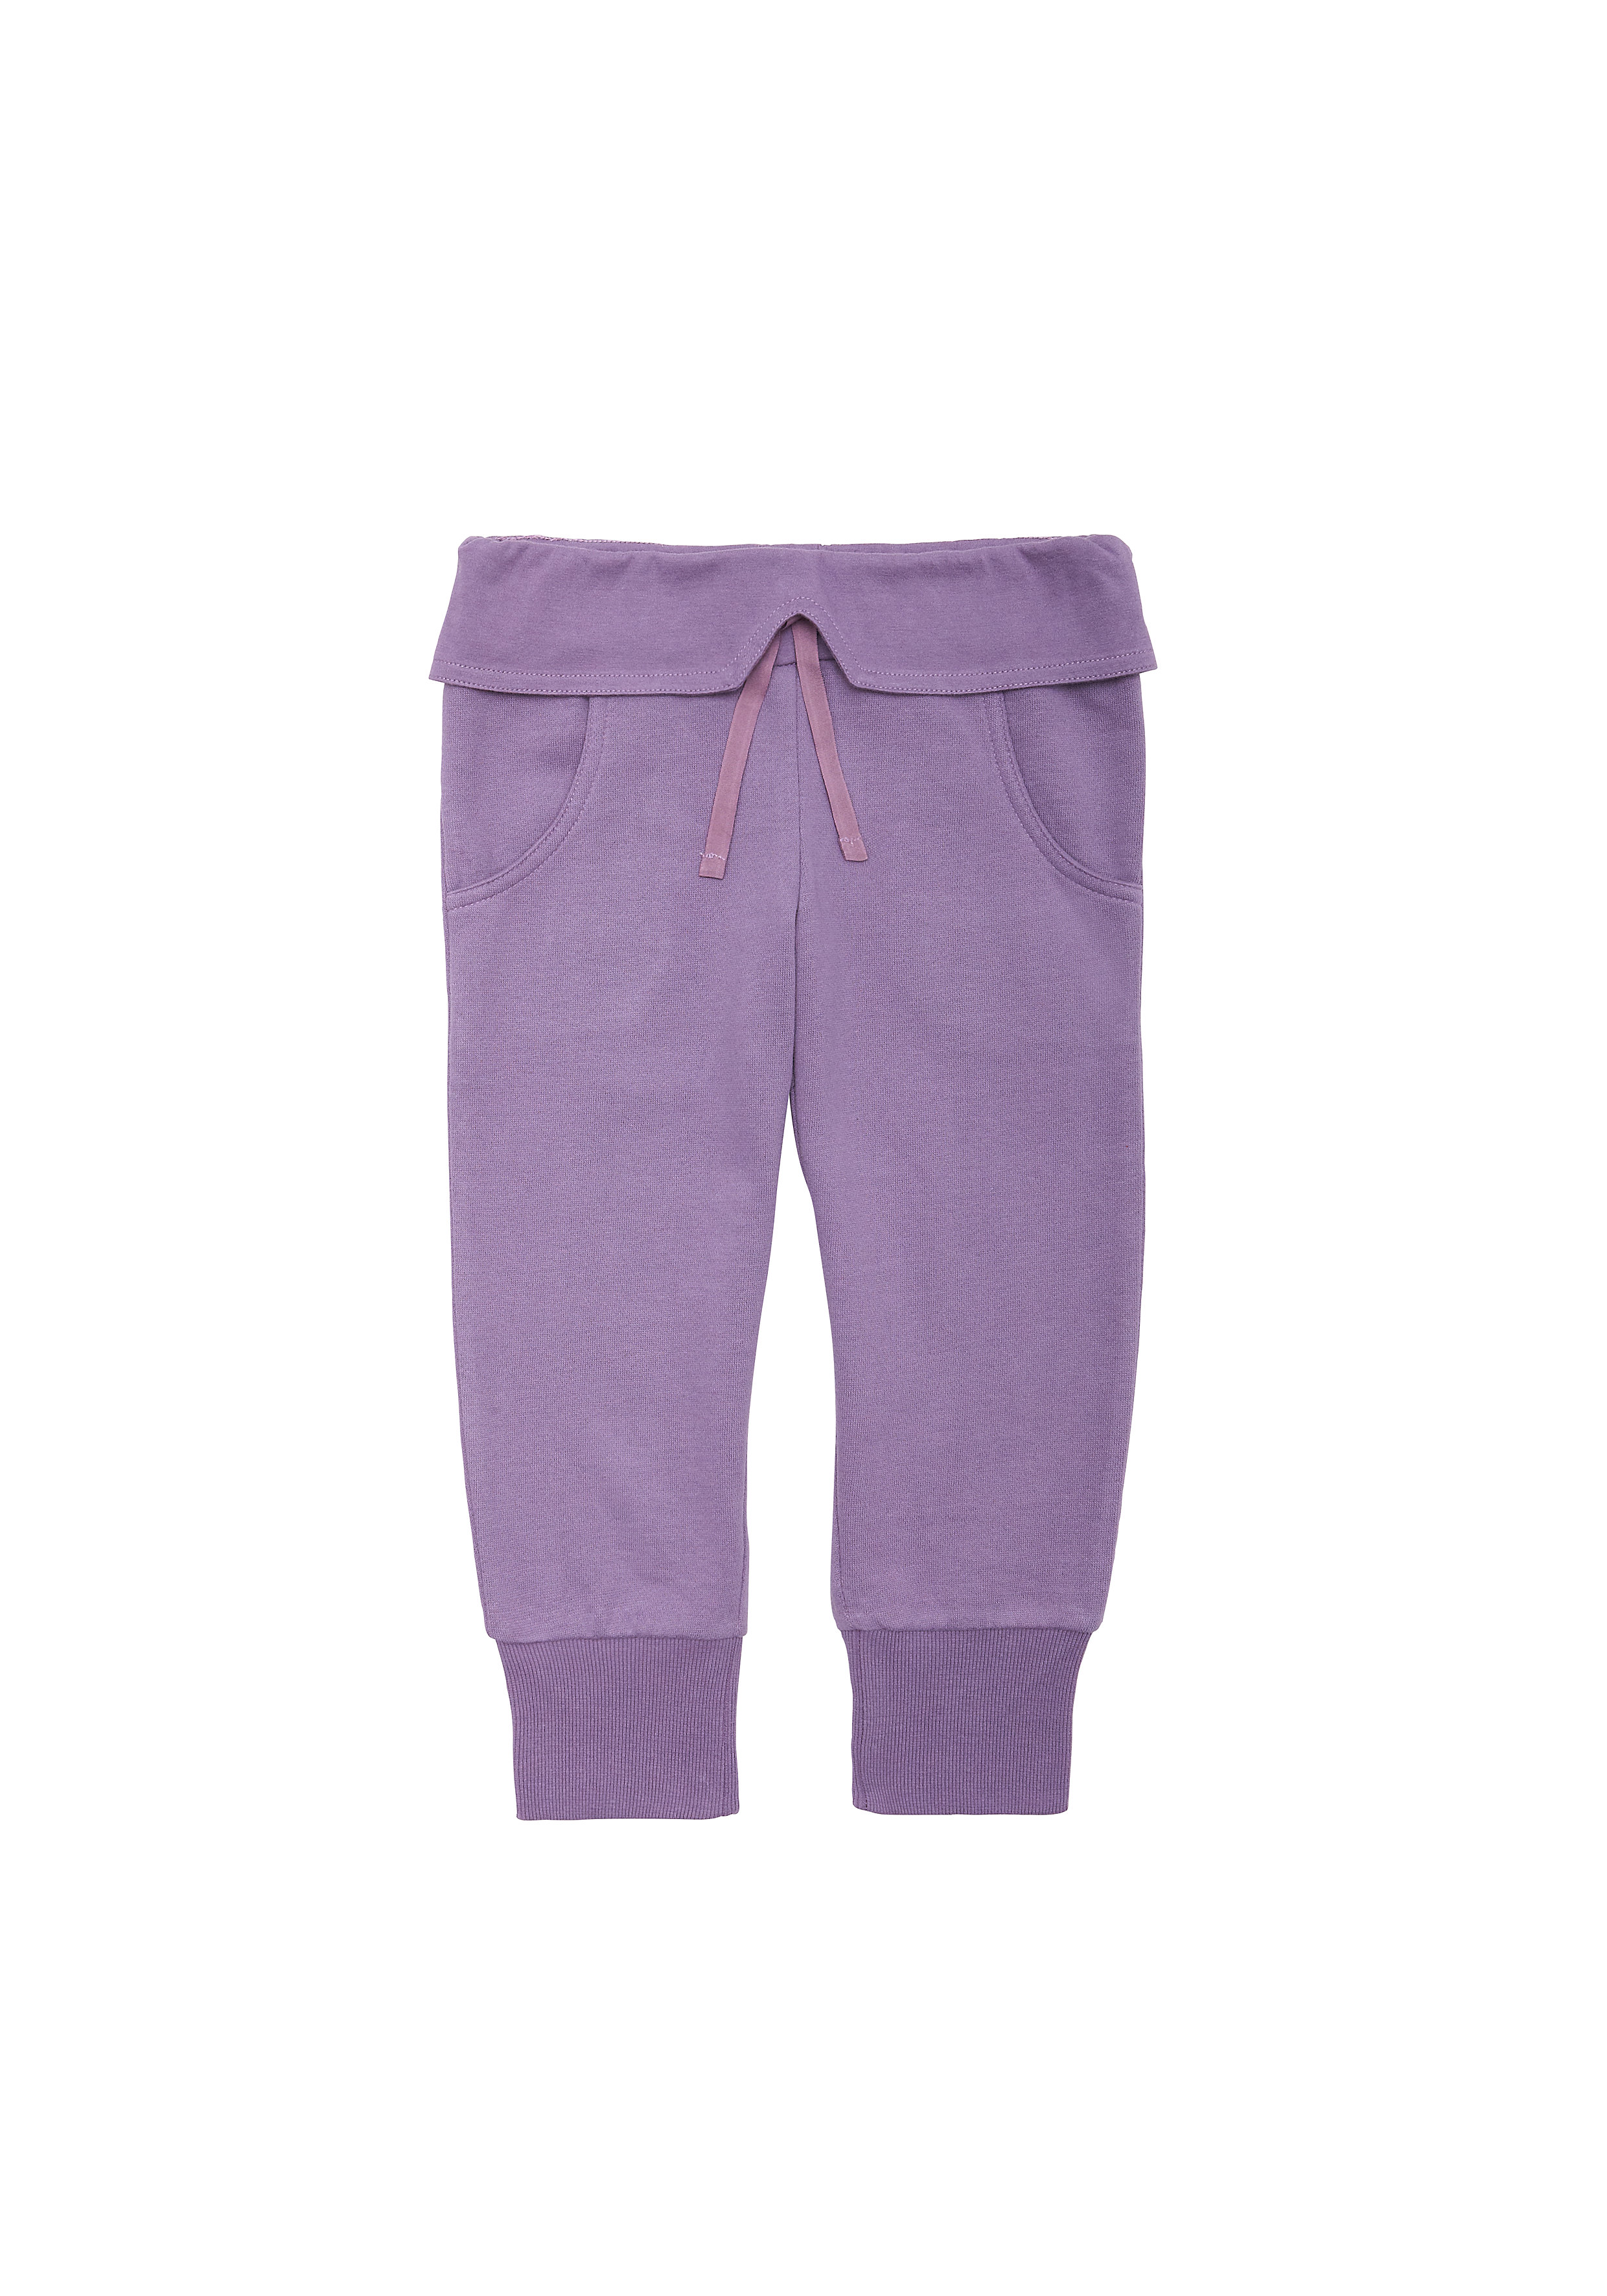 Mothercare | Girls Joggers - Purple